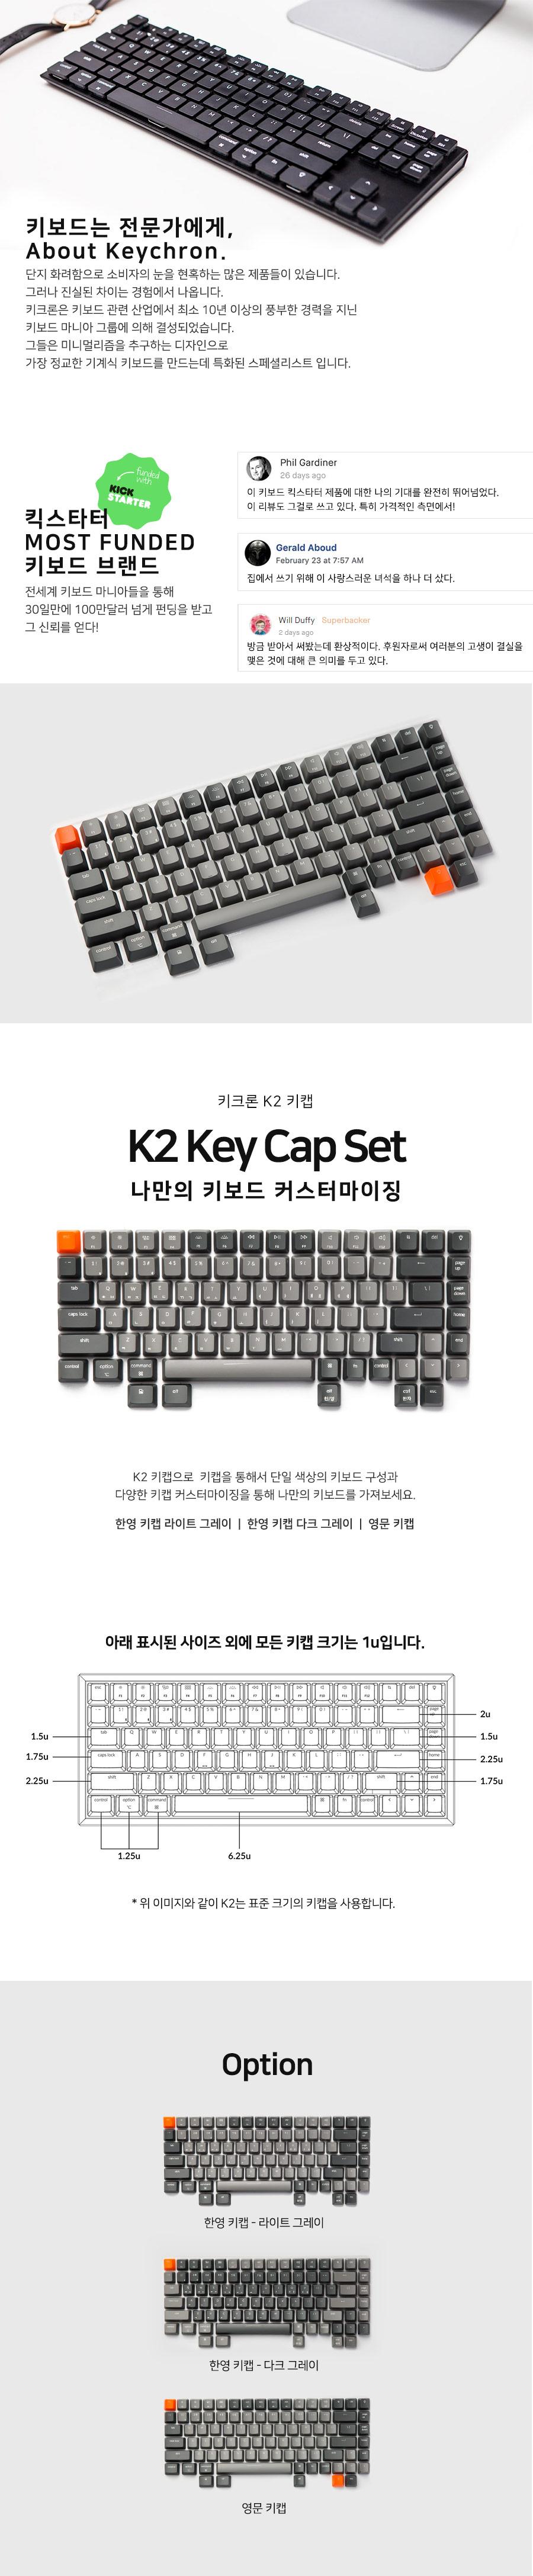 Keychron K2용 한글 키캡 (라이트그레이)